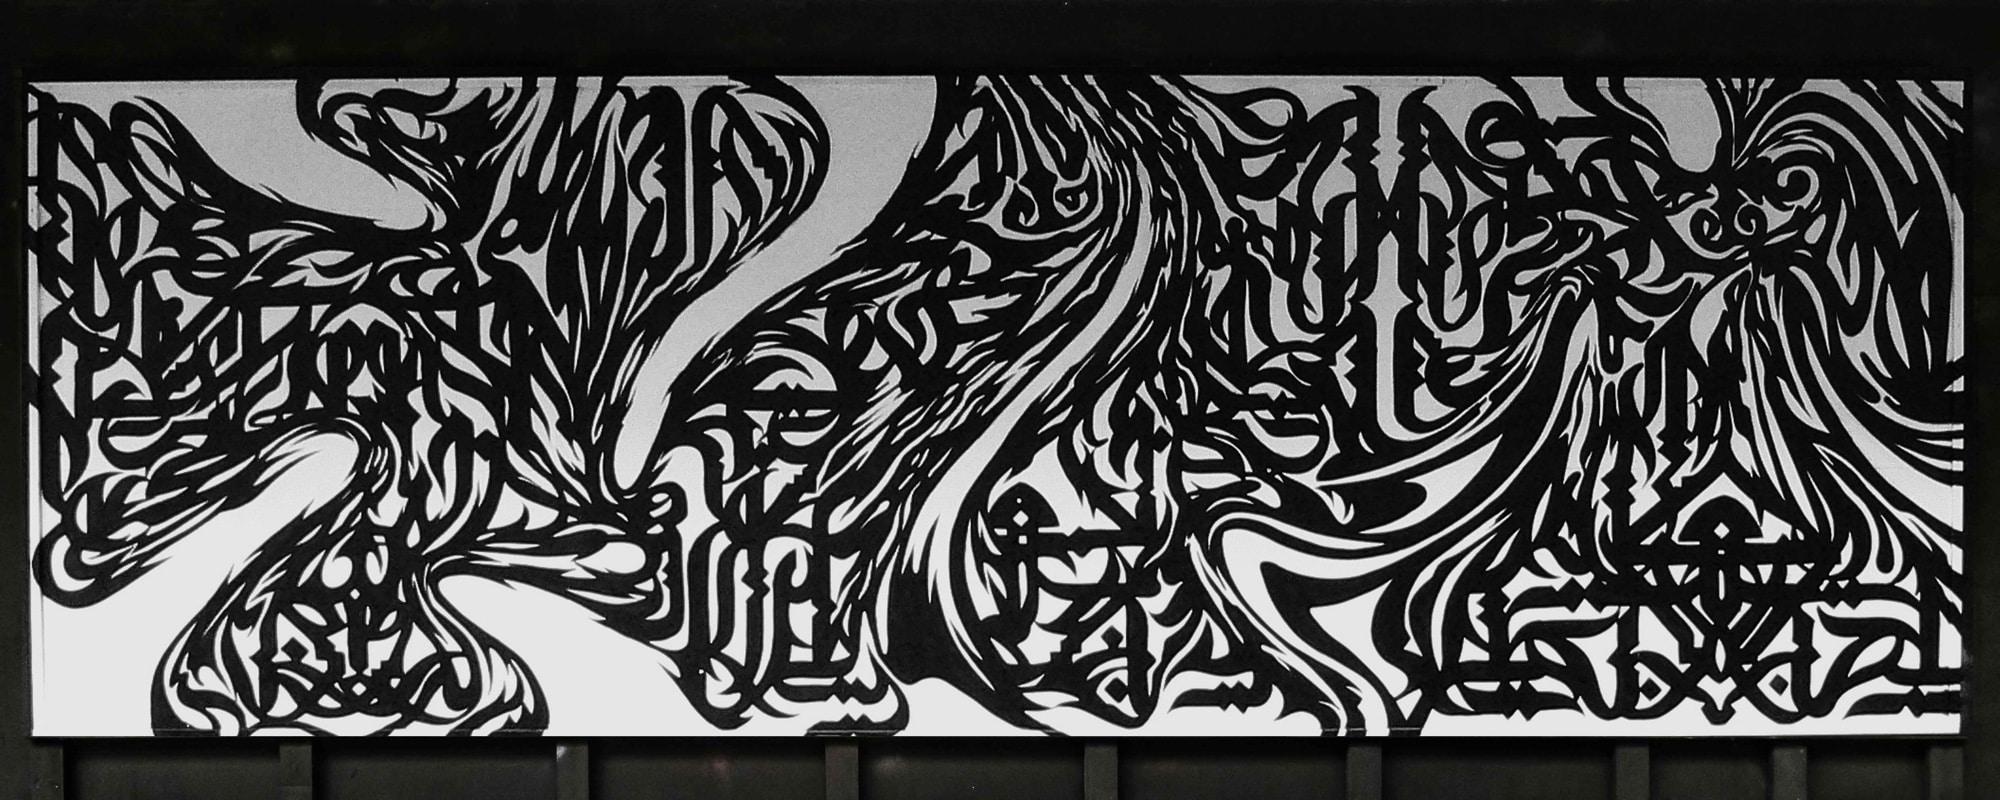 Street Artist : Djamel Oulkadi